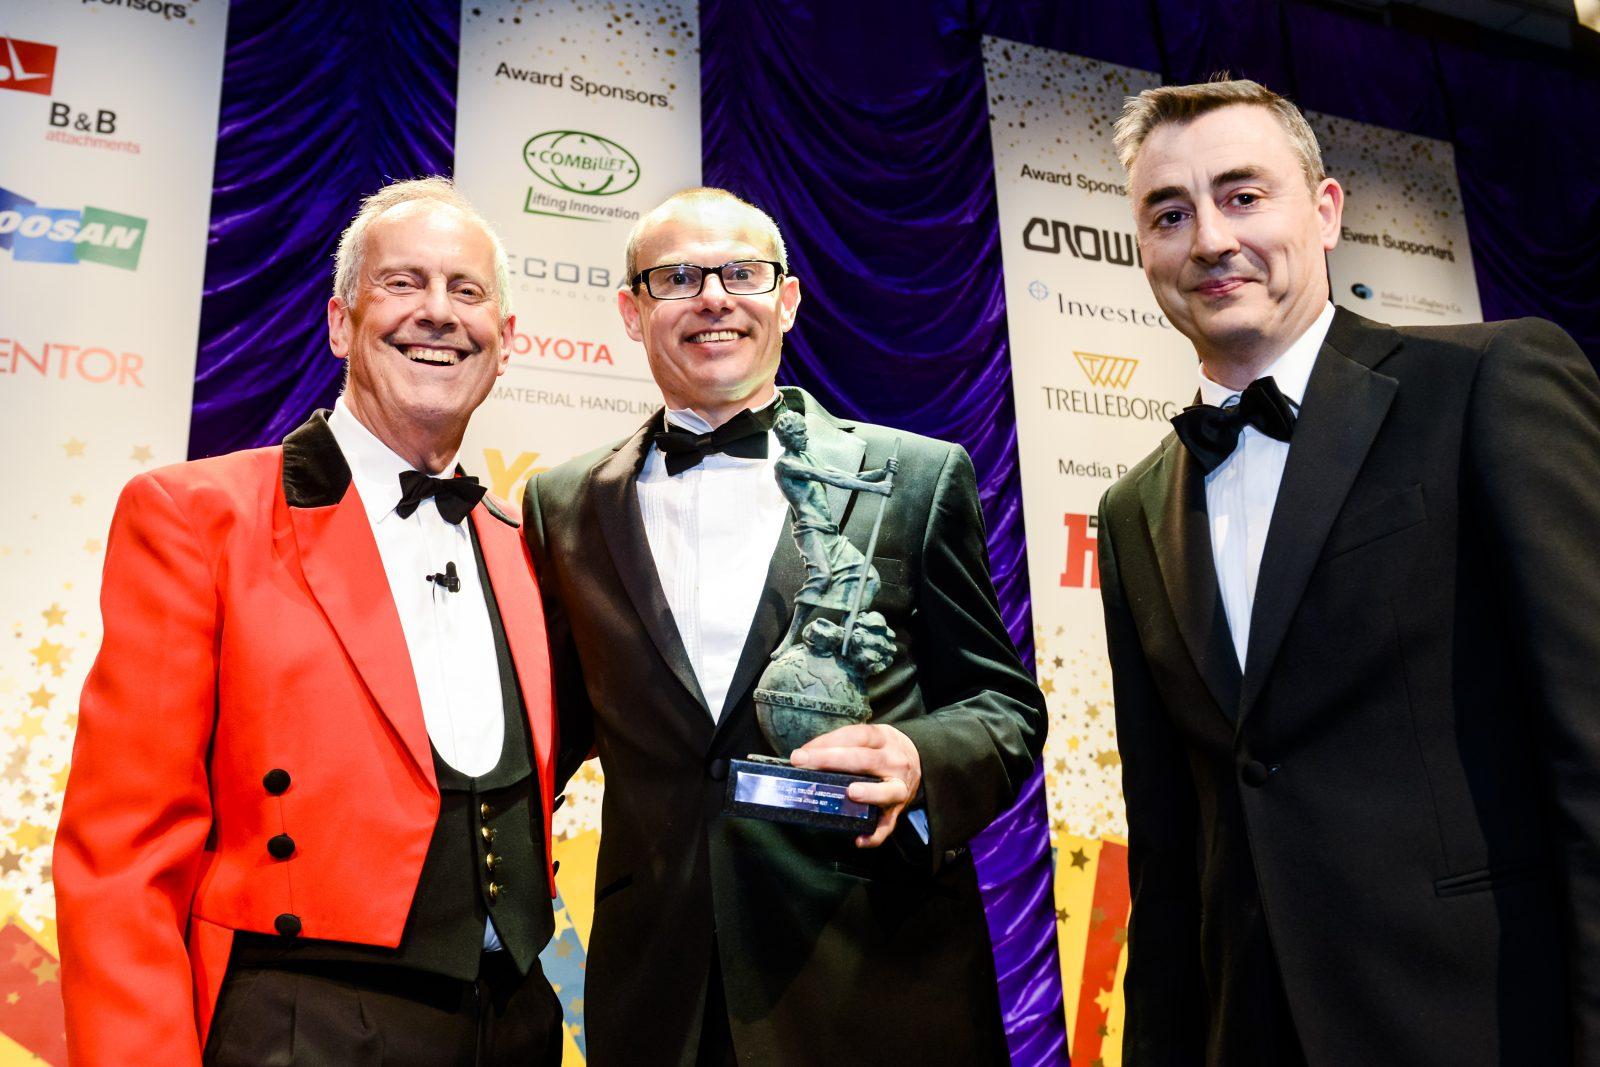 Winners Yale receiving FLTA Award from Giles Brandreth